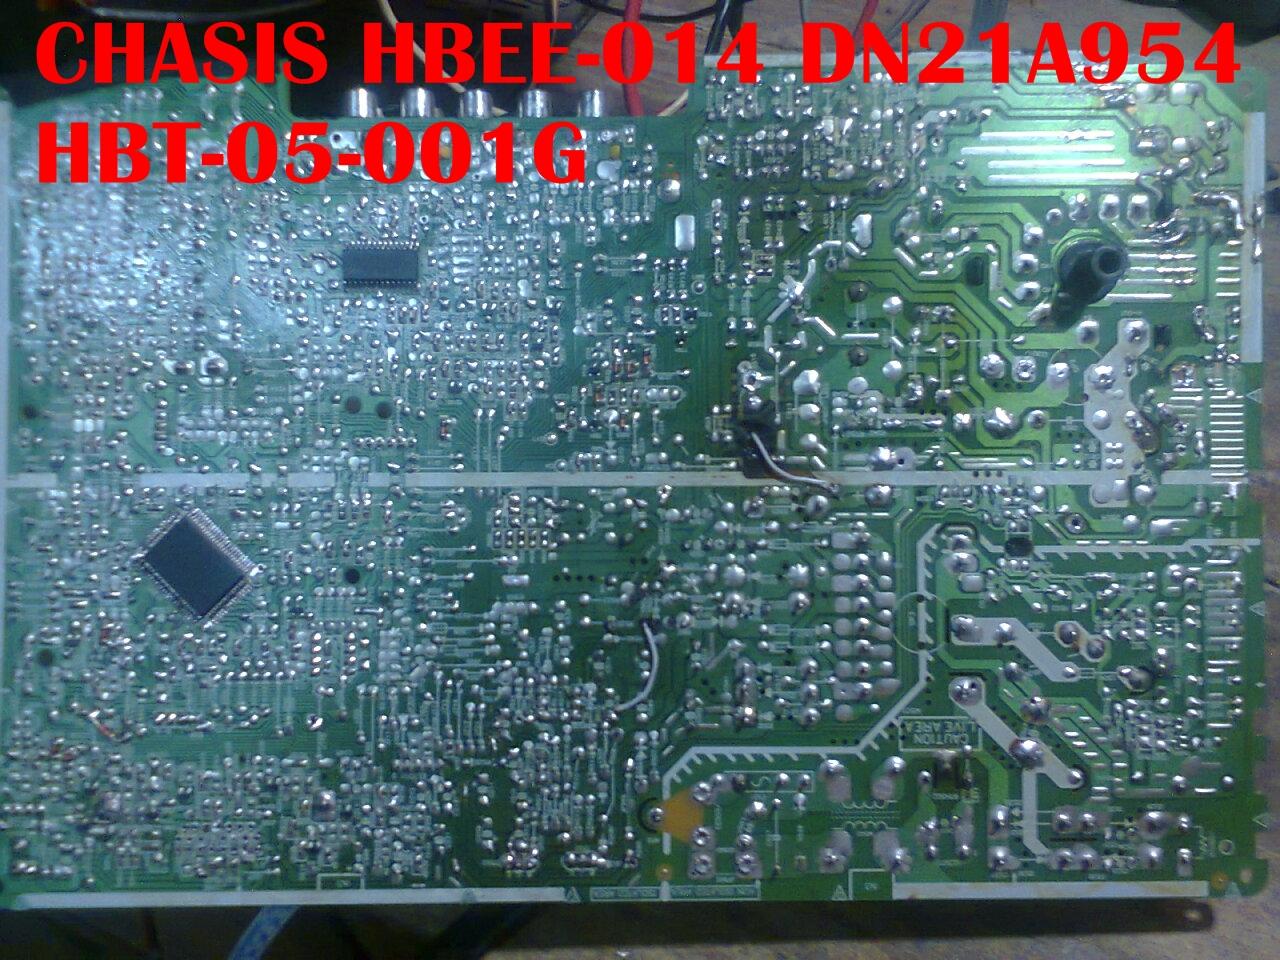 Solder Pecebeq Polytron Slim 21inch Blank Hitam Tanpa Osd Hbt 05 Lowjadi Circuit Schematic Diagram